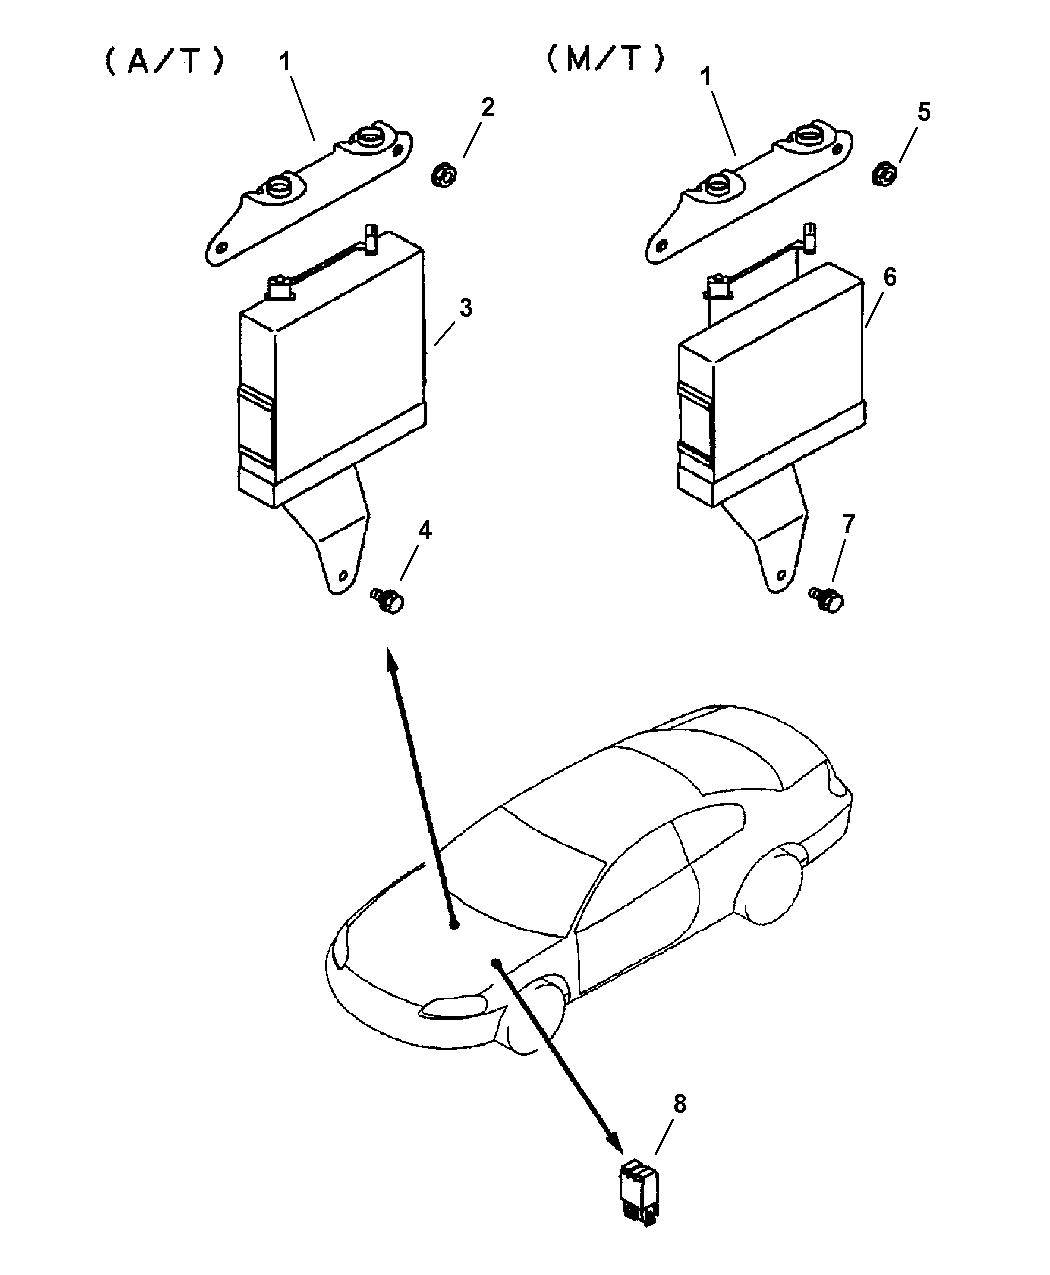 2001 Chrysler Sebring Coupe Modules, Engine Control Units